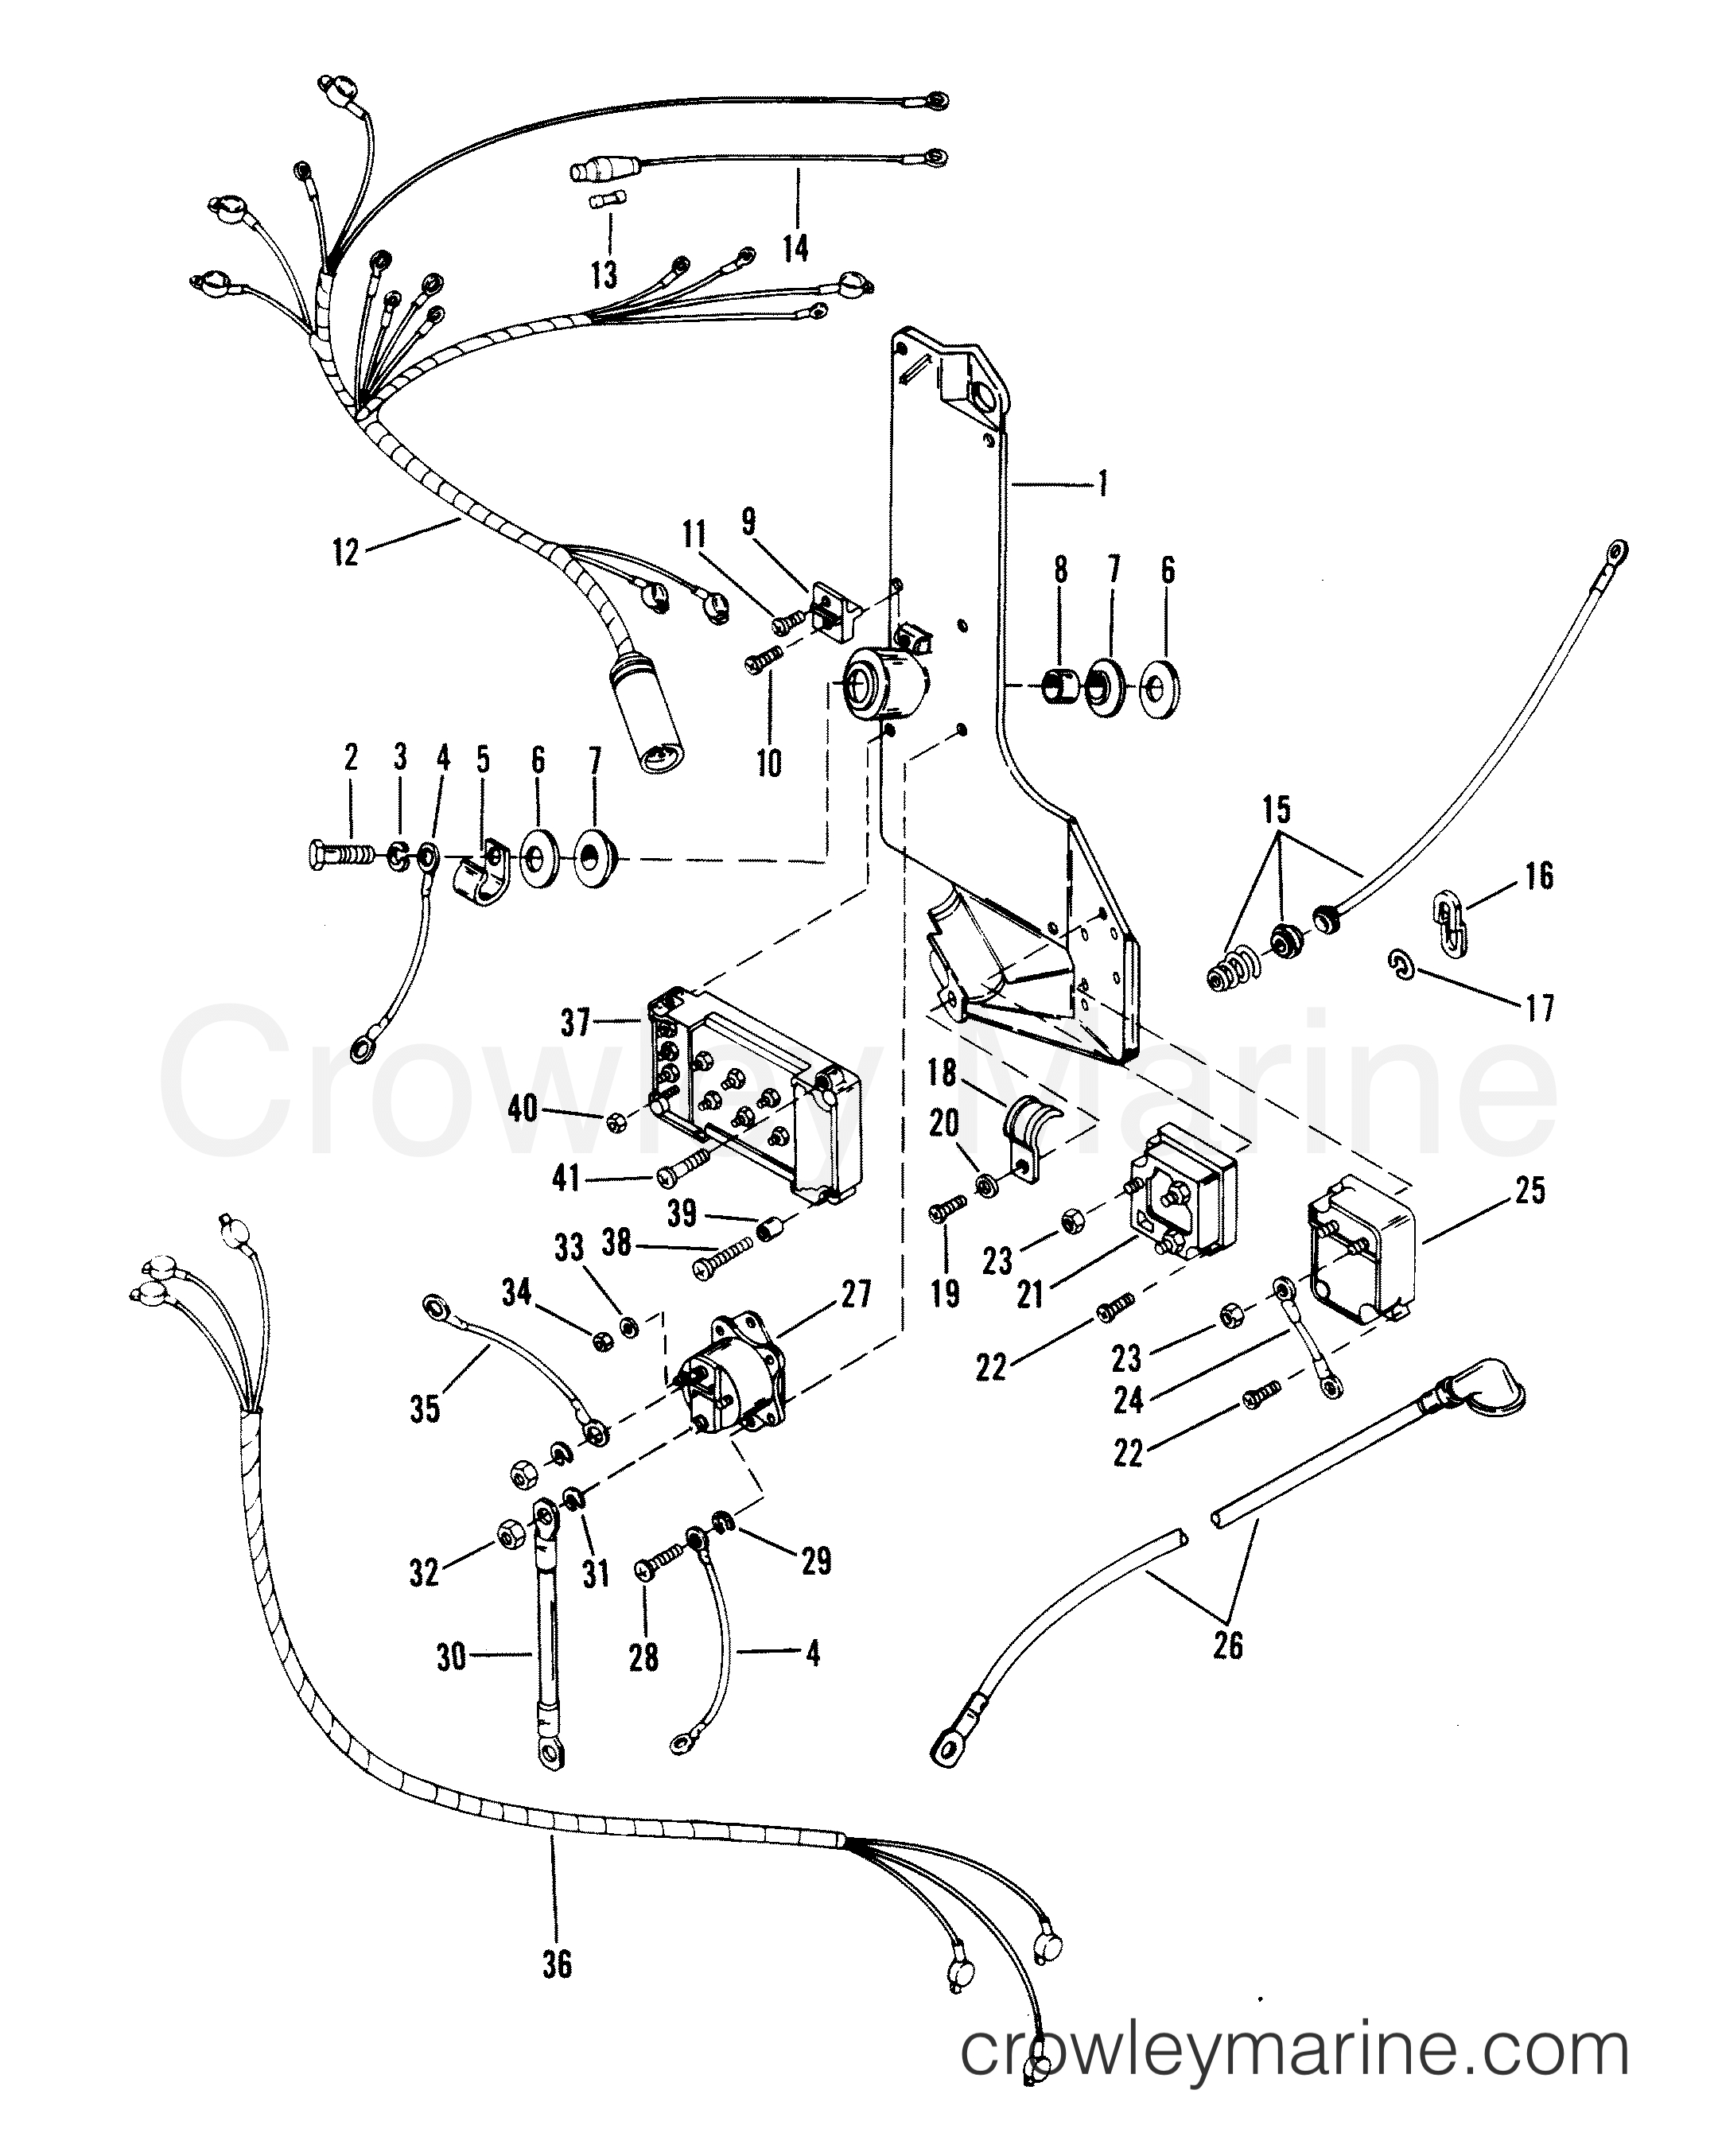 Wiring Harness, Starter Solenoid And Rectifier - Serial Range - Mercury Outboard Rectifier Wiring Diagram